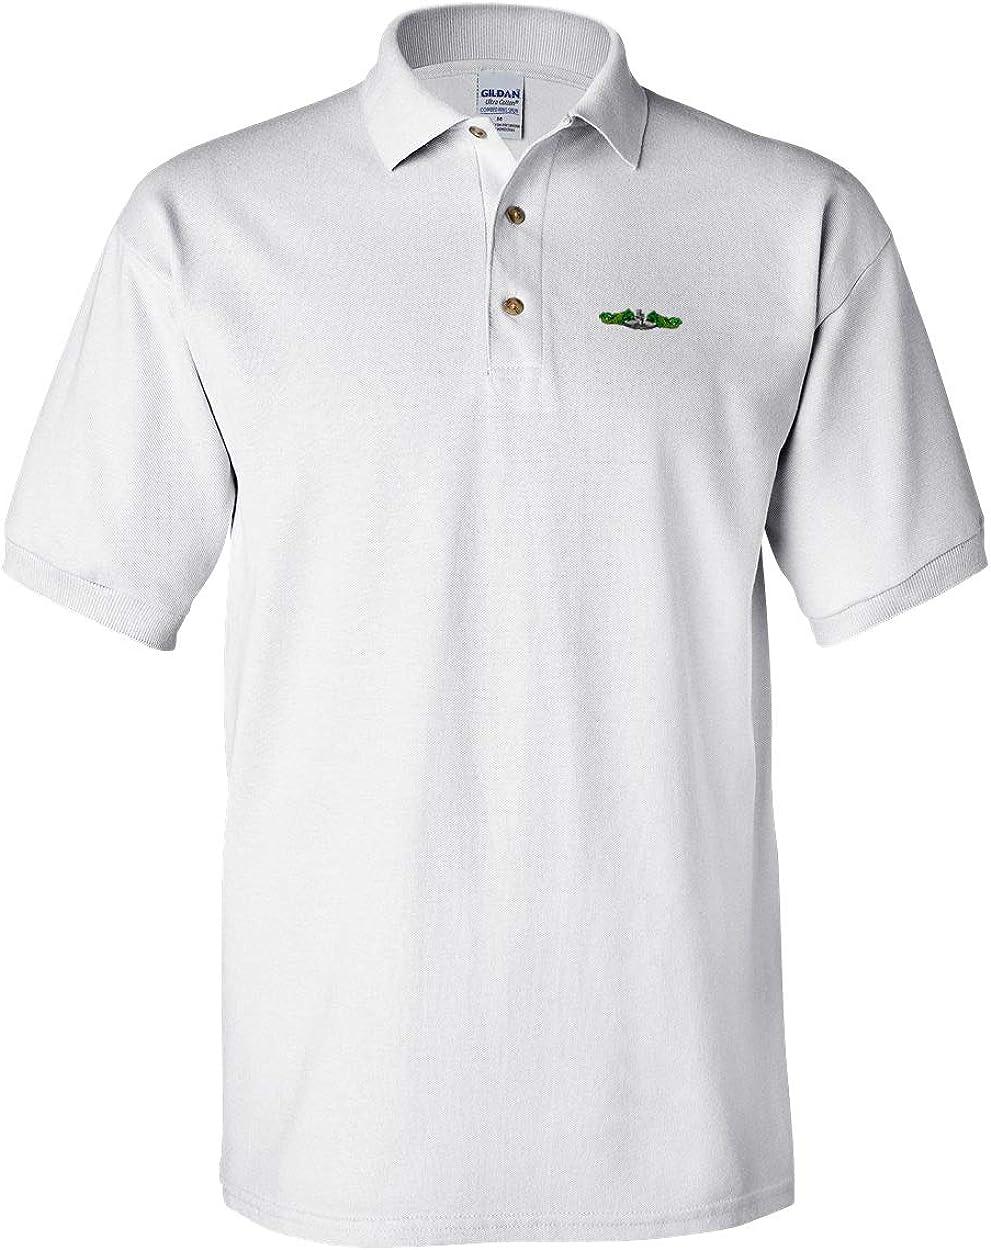 Polo Shirt Sub Dolphins Logo Military